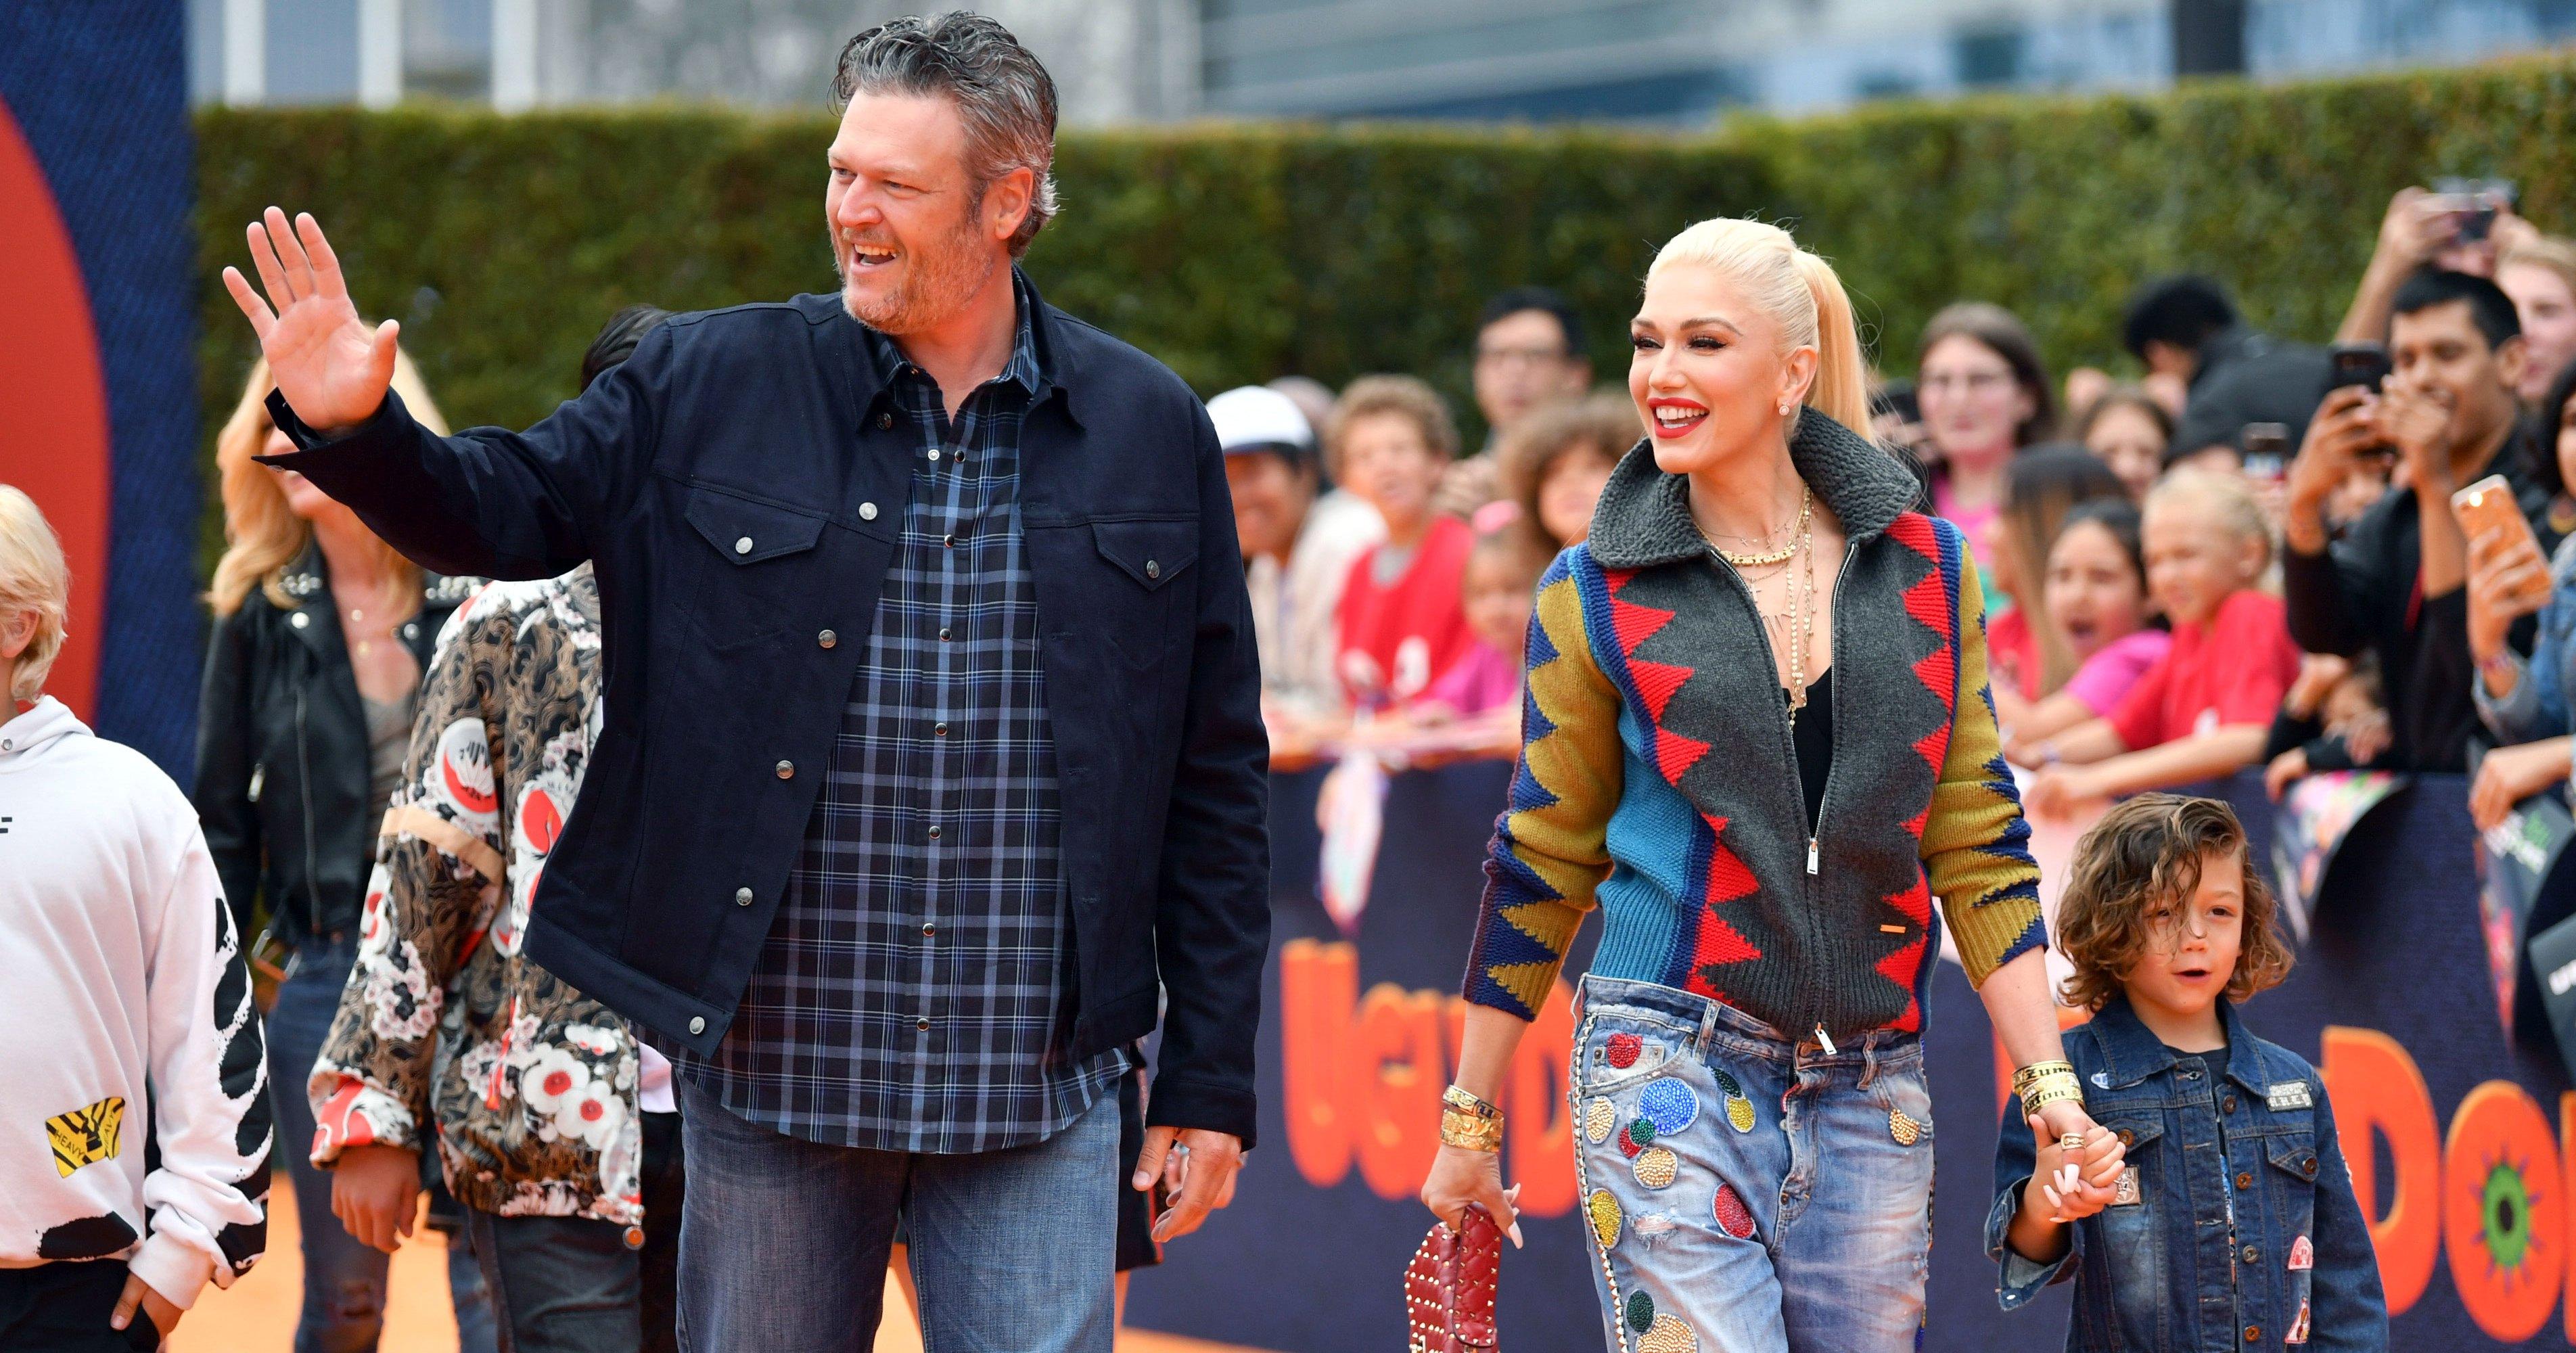 Blake Shelton and Girlfriend Gwen Stefani Make Red Carpet Debut With Her Kids at 'UglyDolls' Premiere: Pics